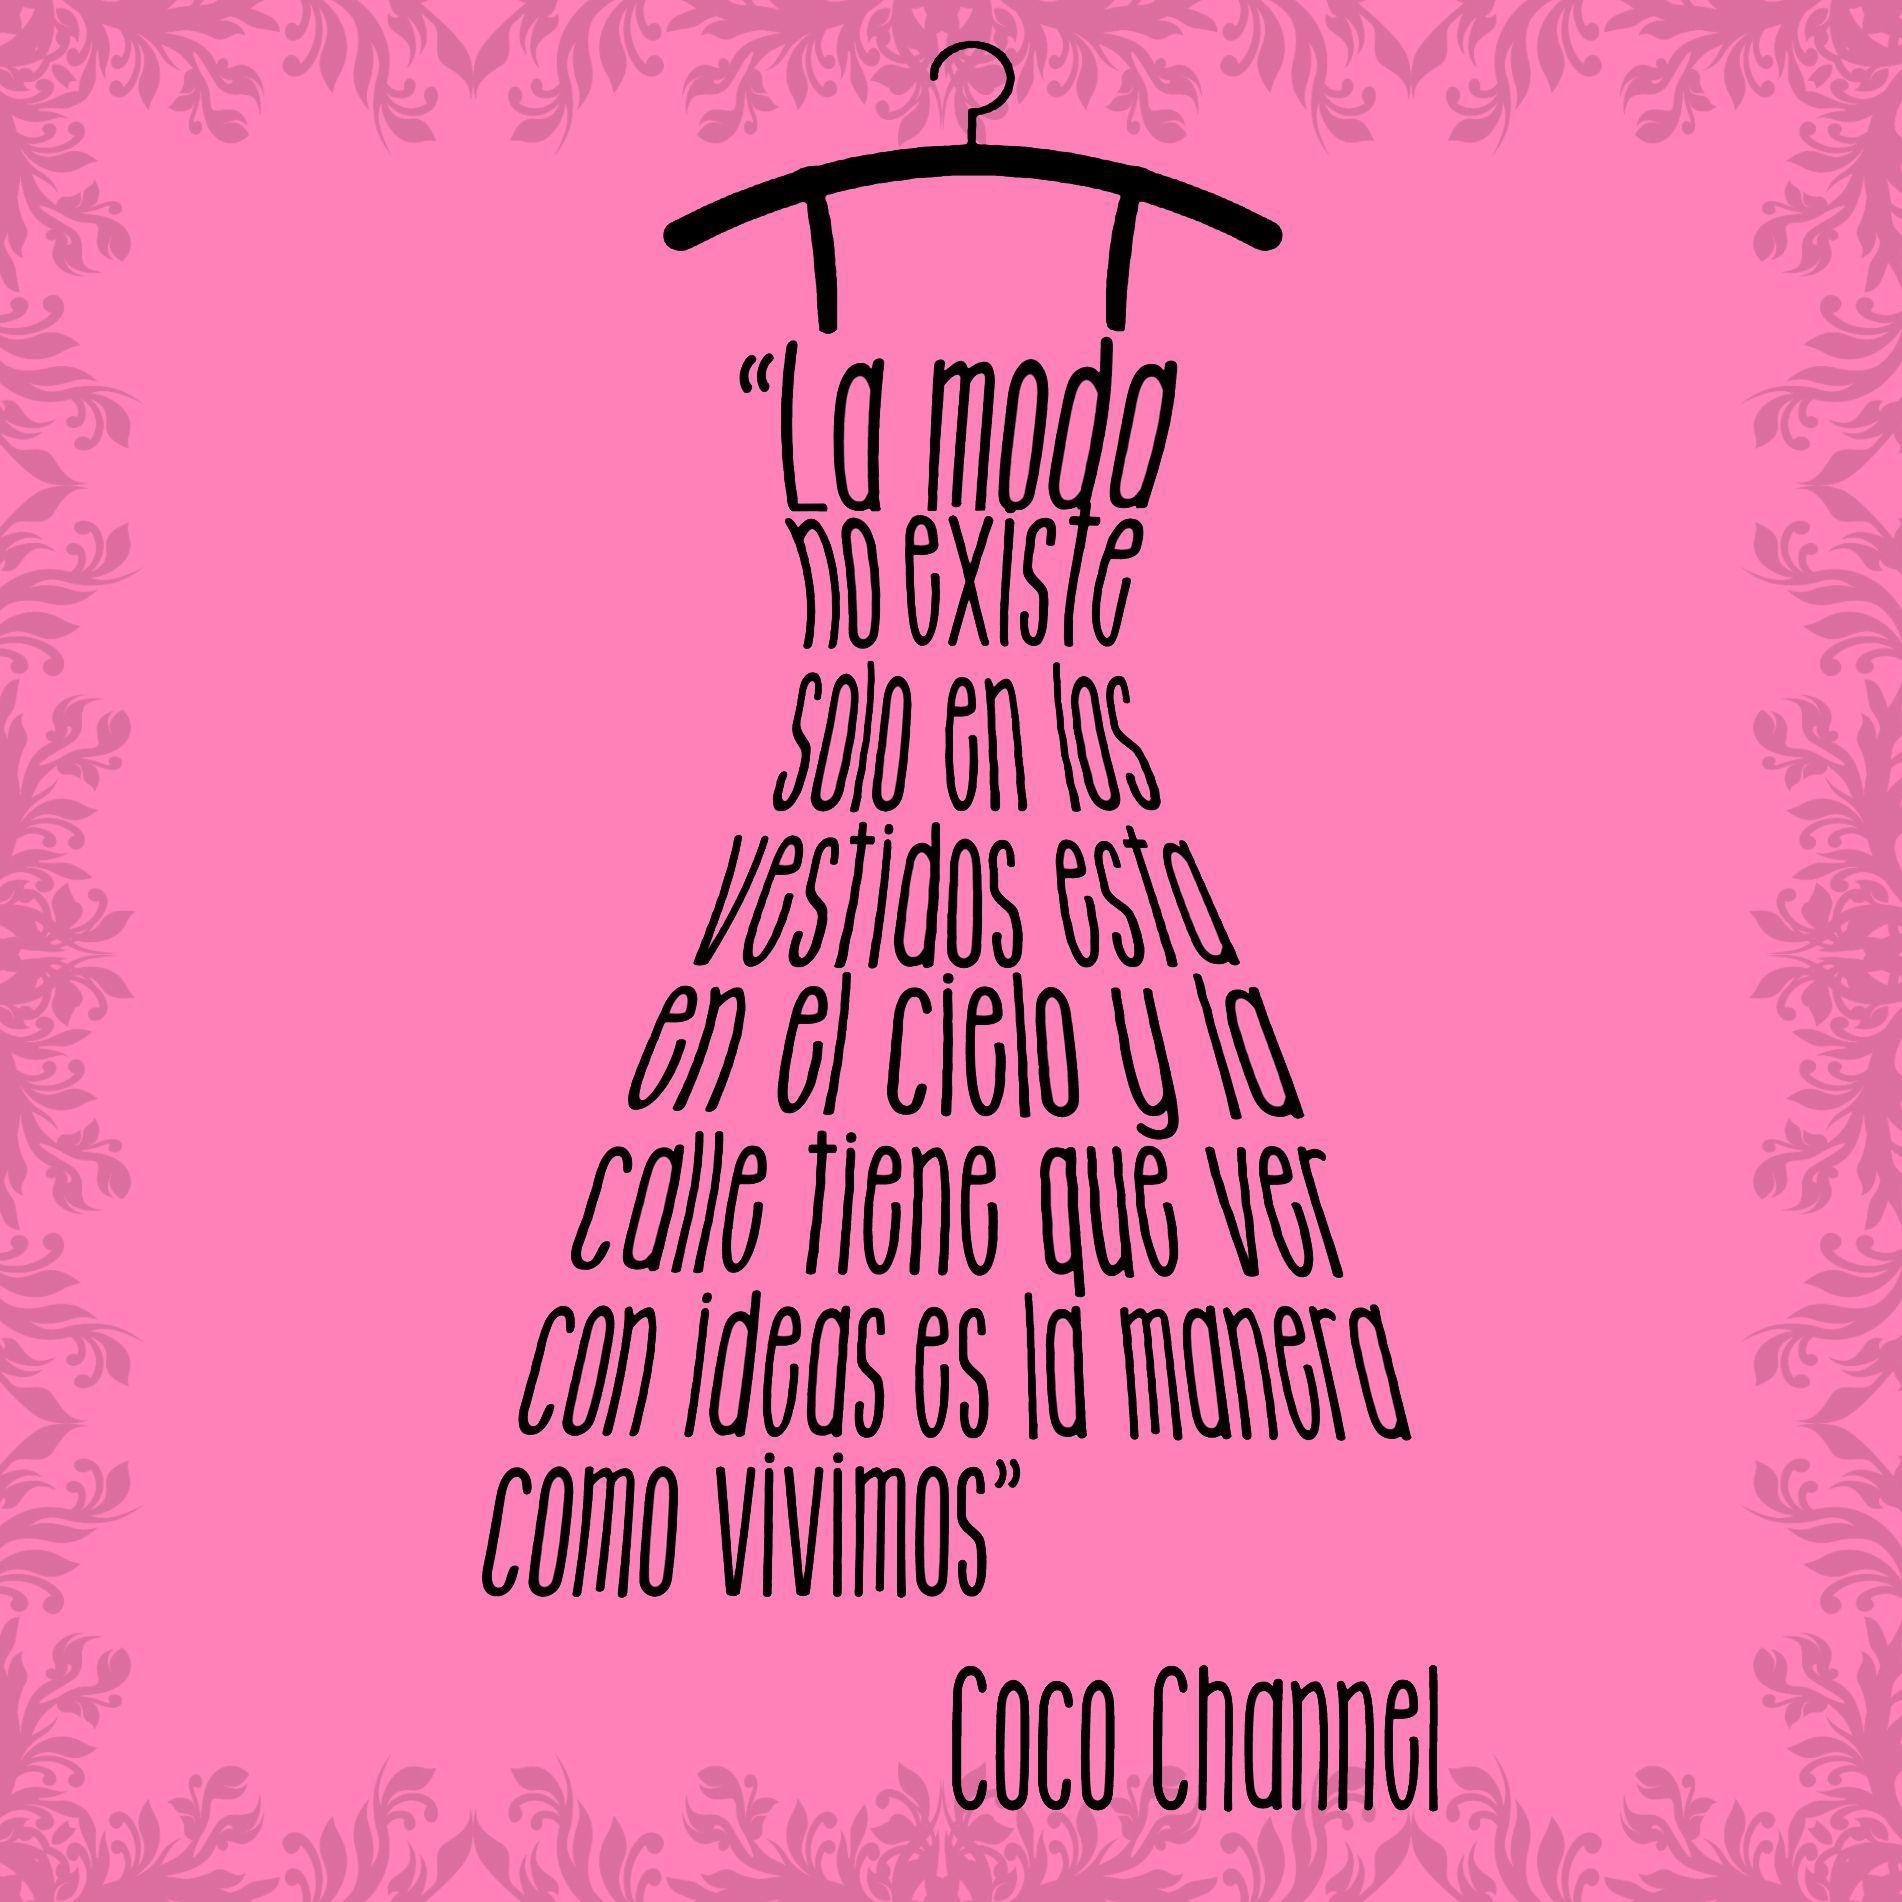 Coco Chanel Wall Stickers Frases De Coco Chanel Frases De Moda Pinterest Coco